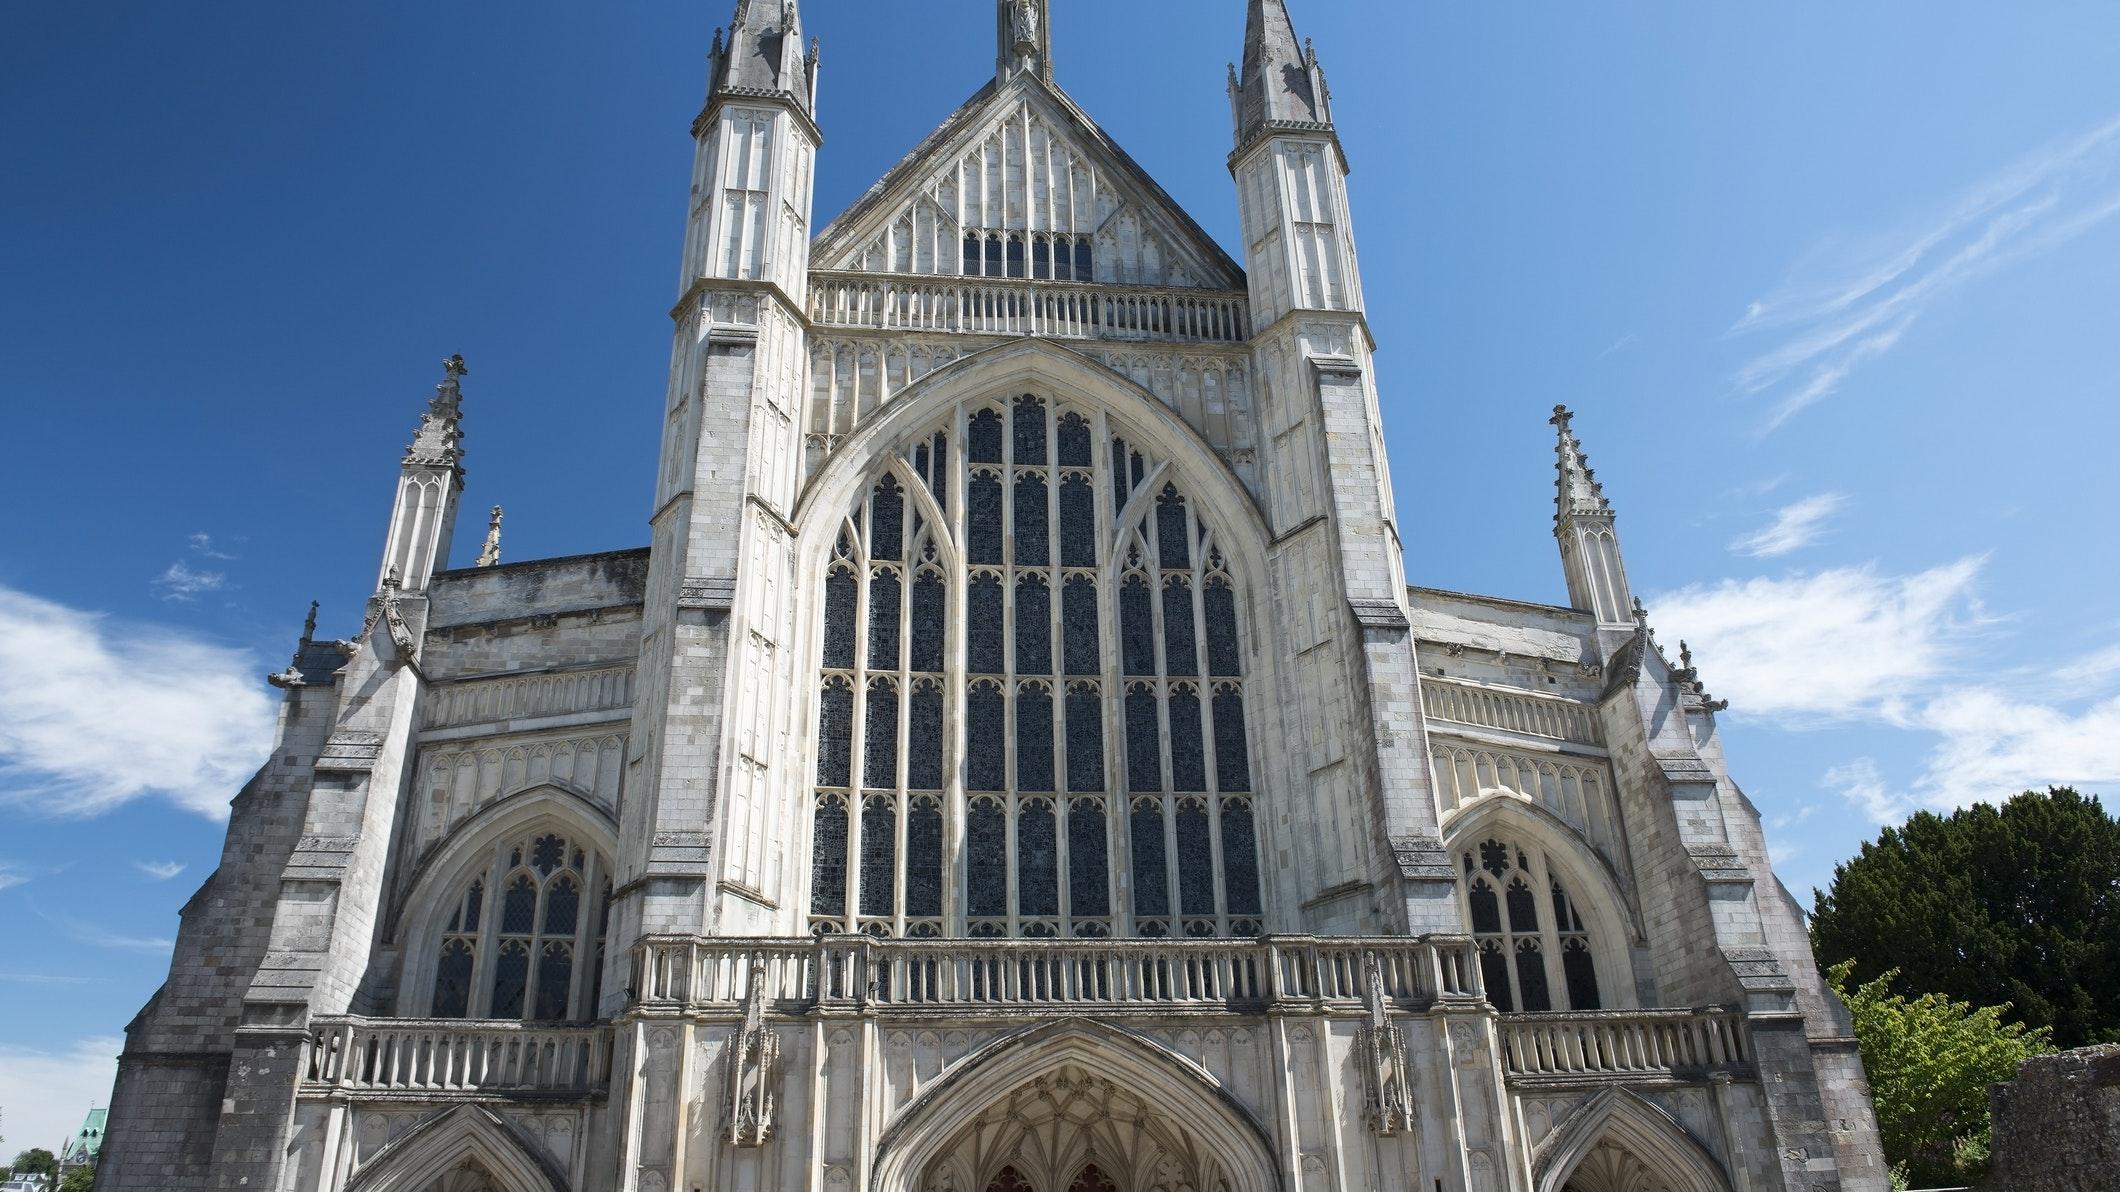 11 Secrets Hidden Inside Britains Magnificent Cathedrals Bt